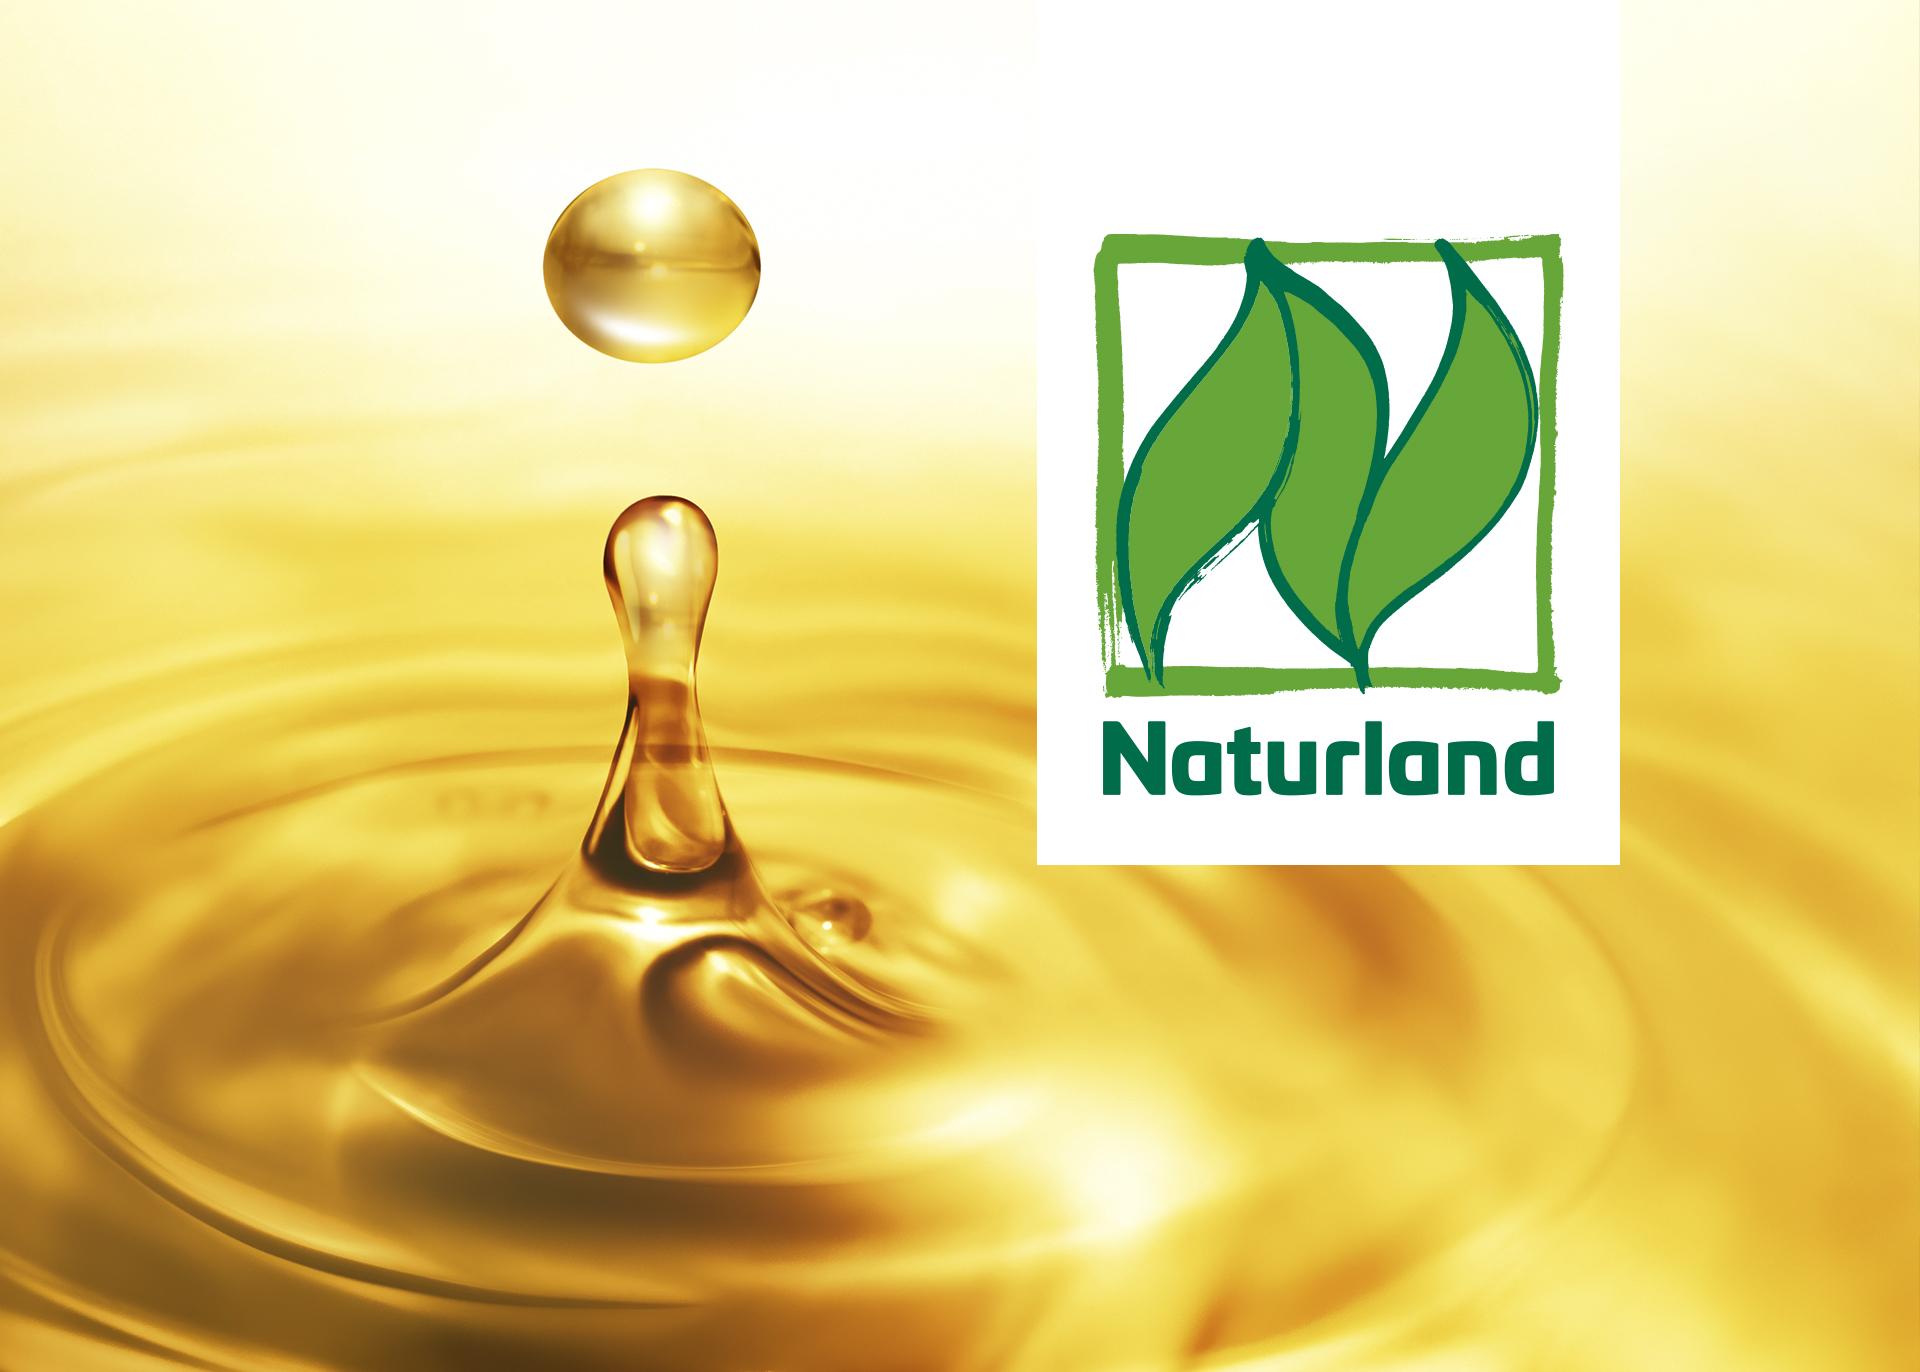 NEU: Naturland Produkte